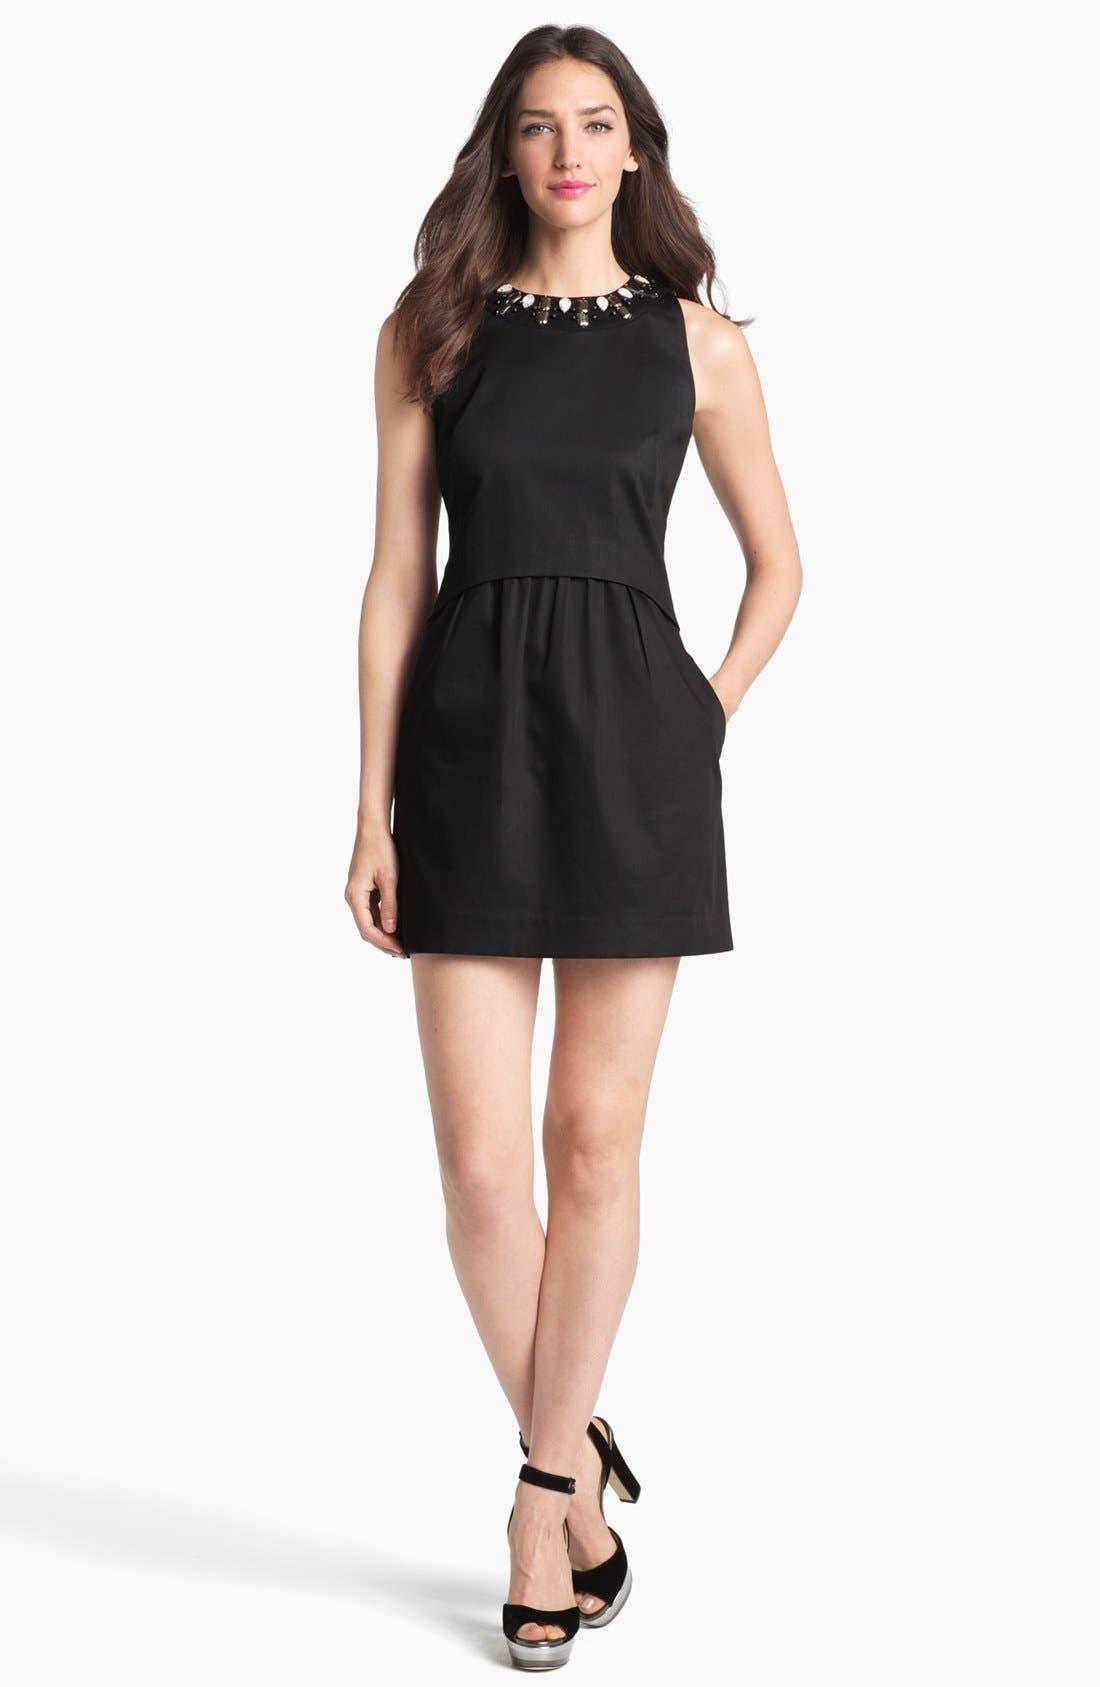 Main Image - Milly 'Astrid' Embellished Stretch Cotton Sheath Dress